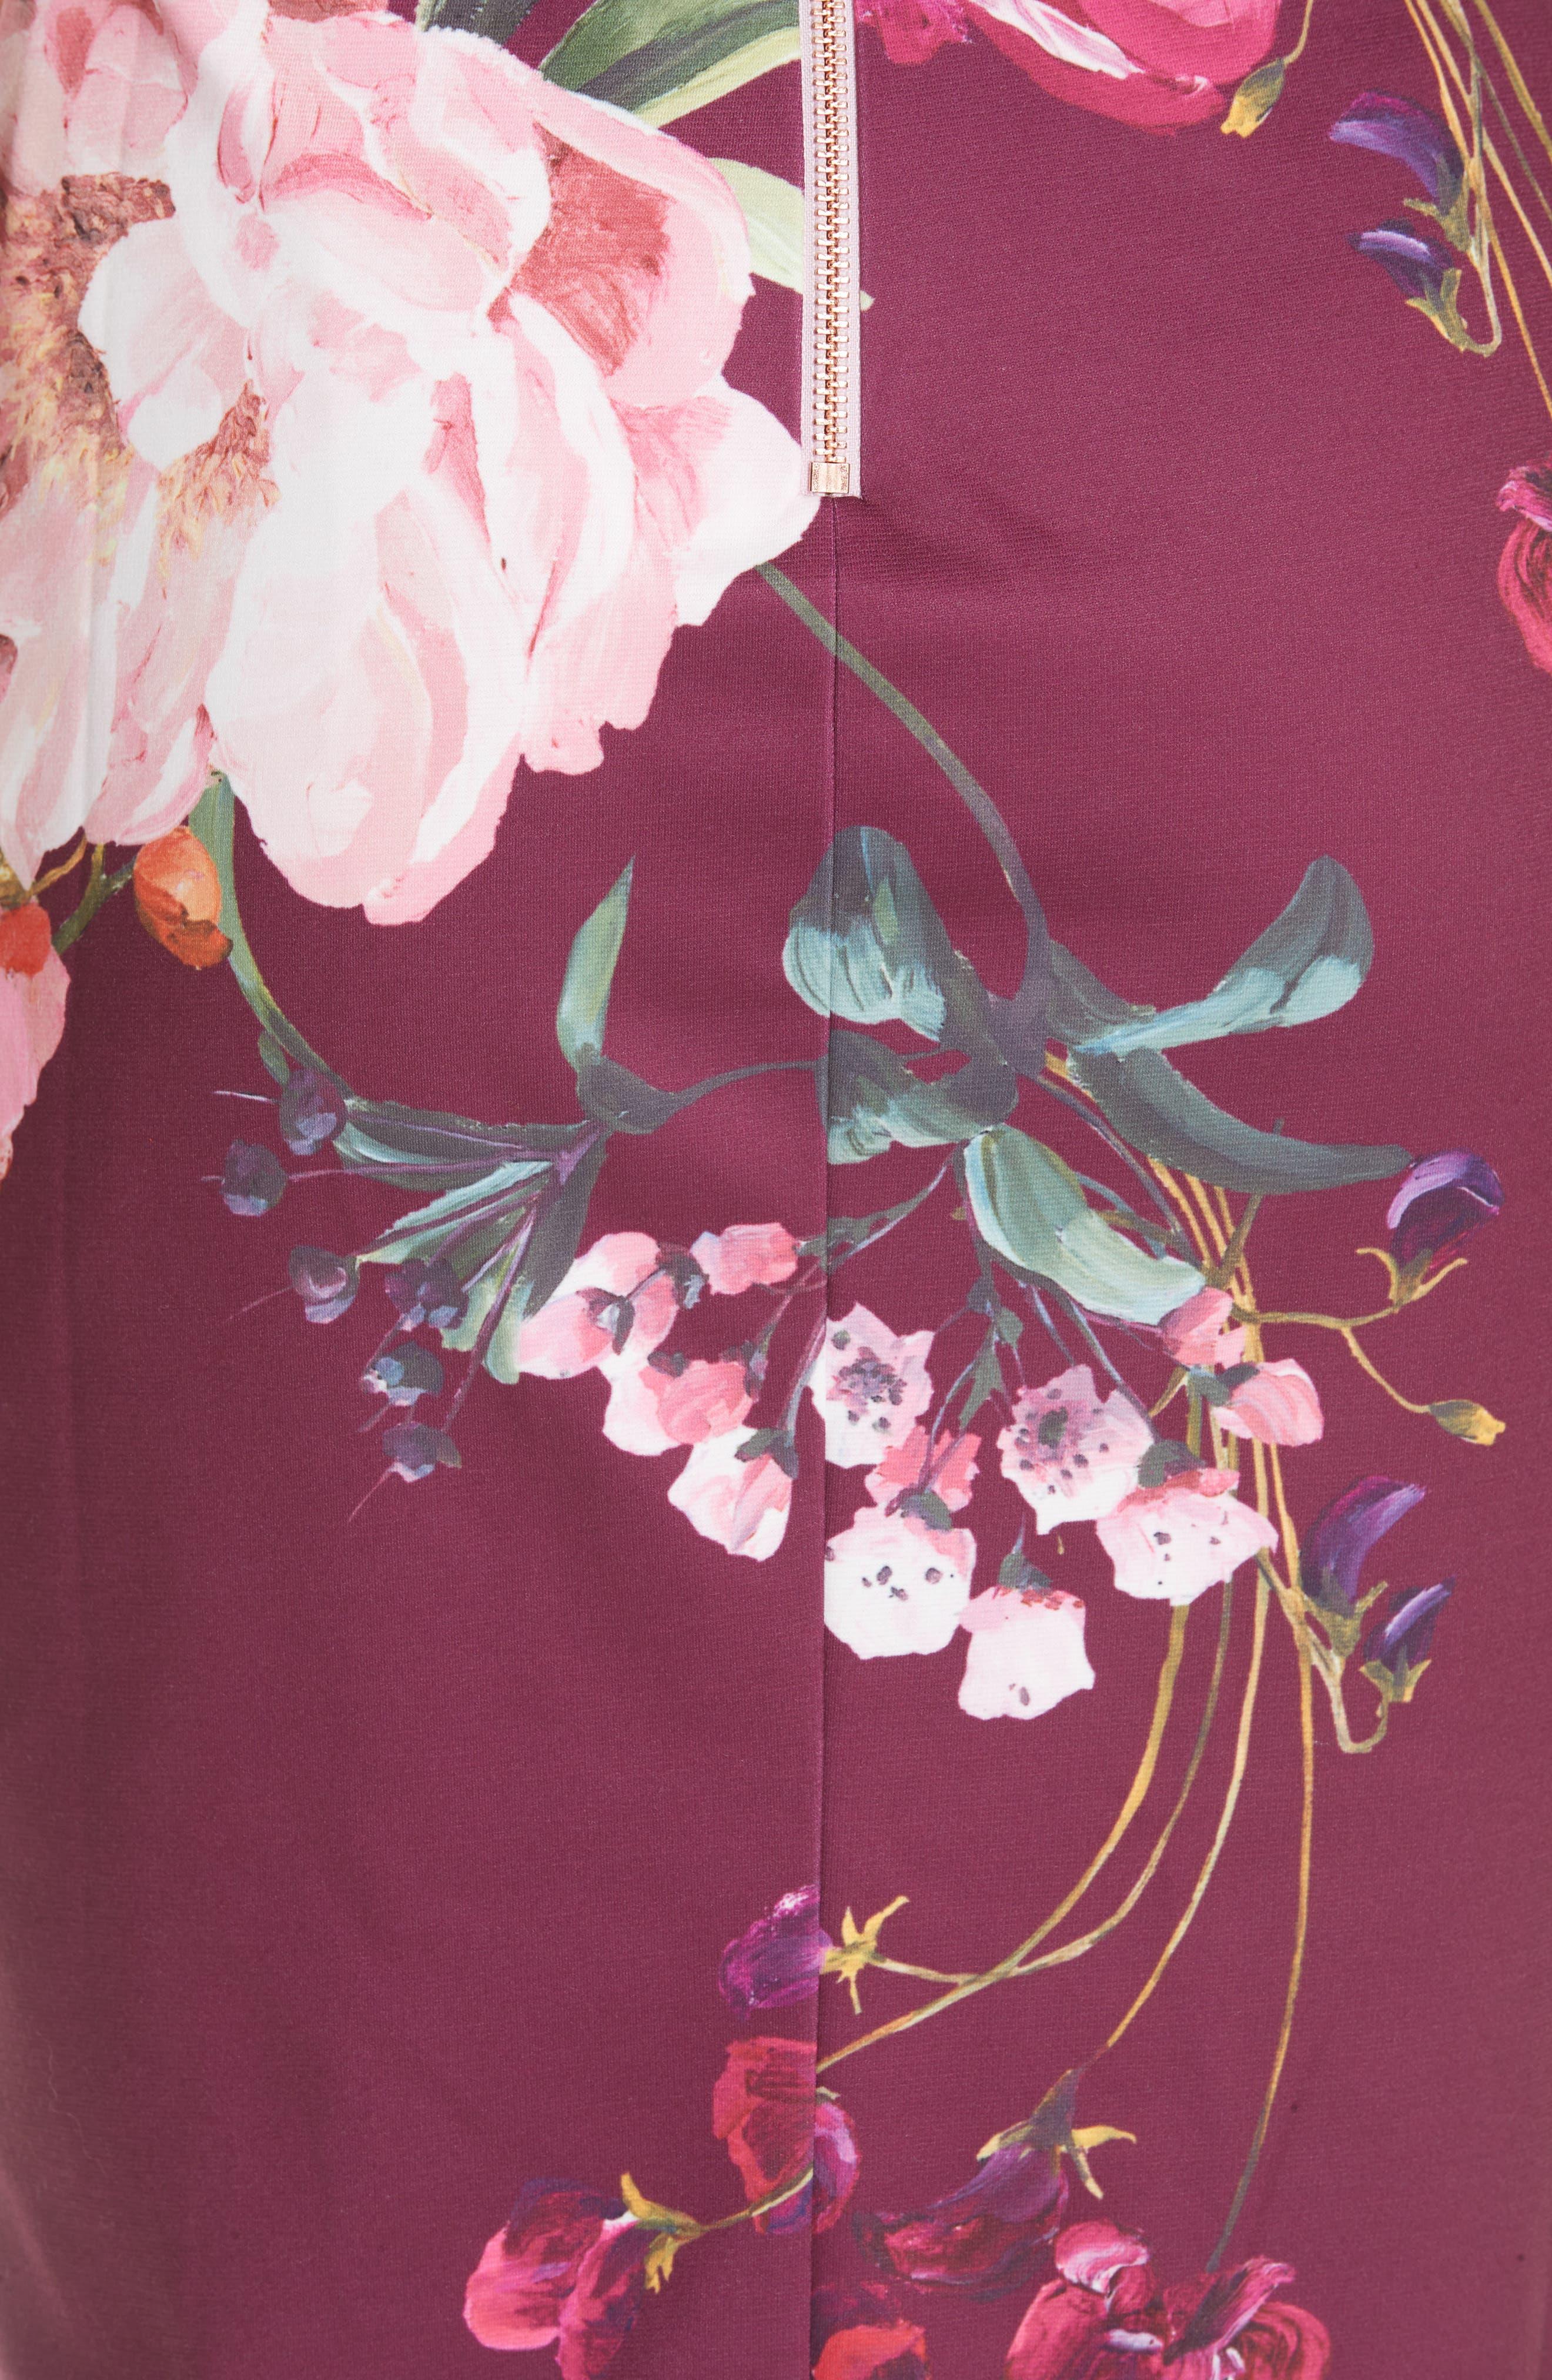 Irlina Serenity Sheath Dress,                             Alternate thumbnail 5, color,                             Lilac